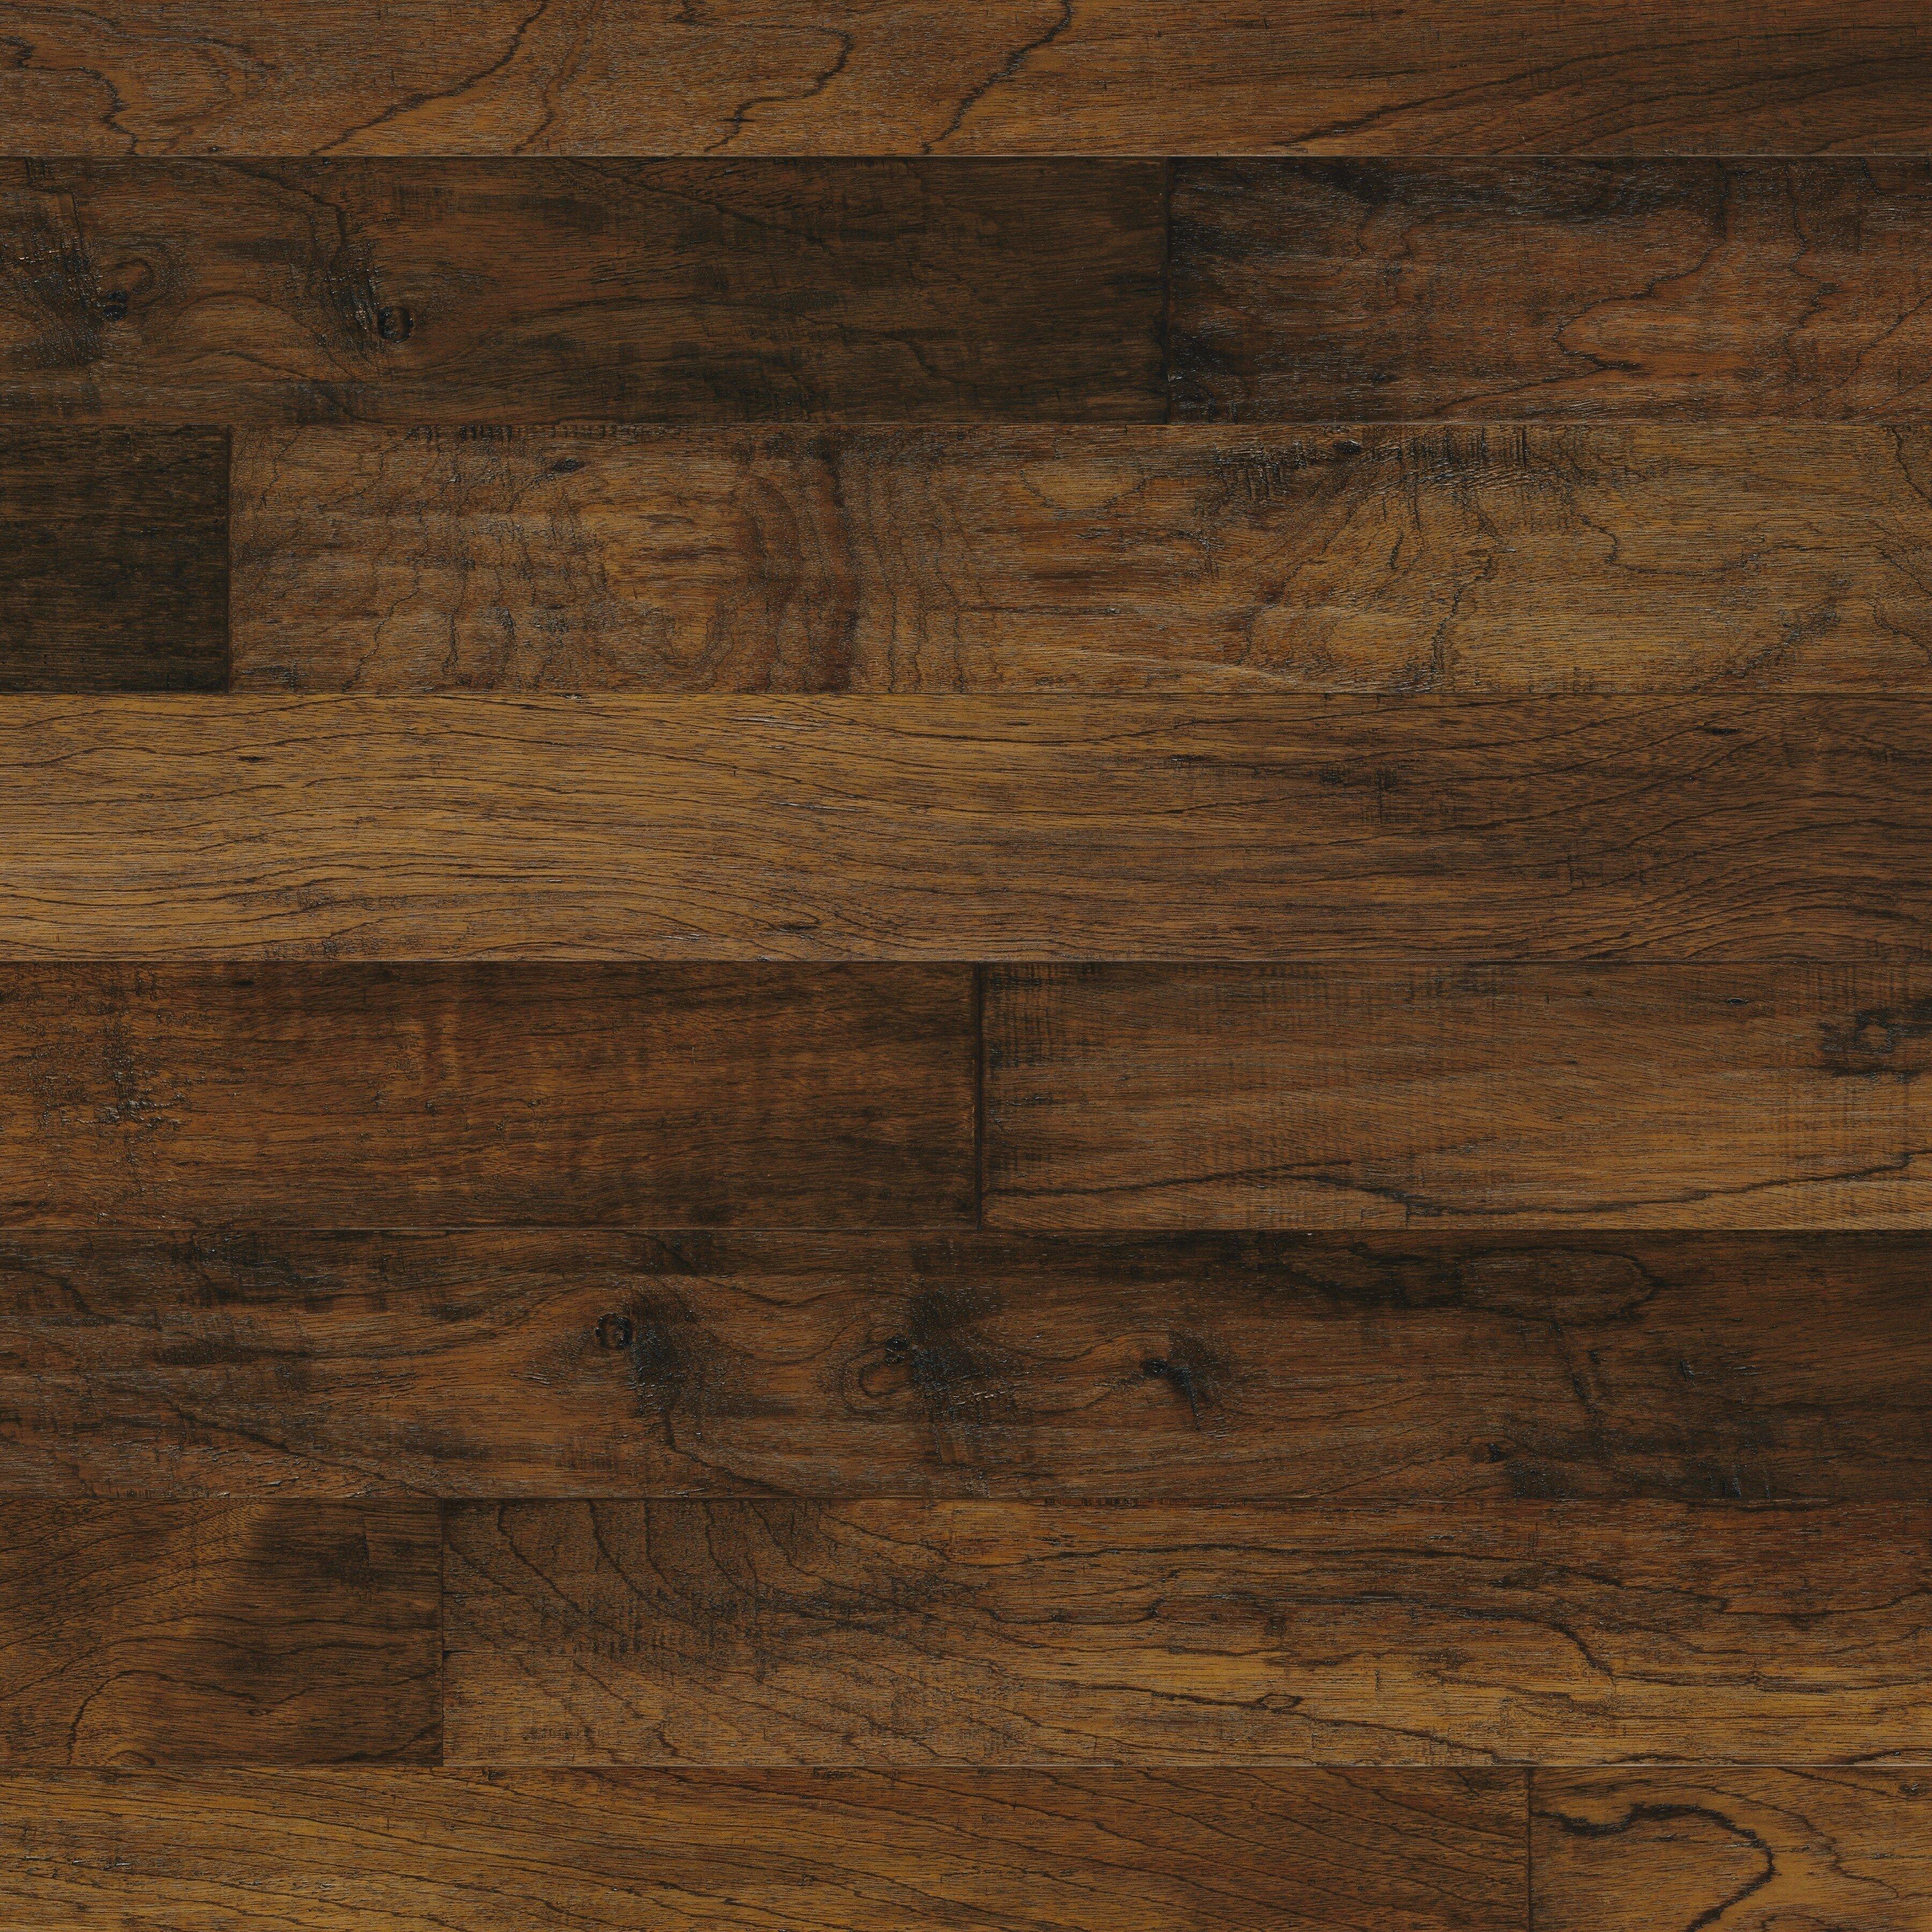 Mannington Laminate Flooring Reviews mannington laminate restoration collection fairhaven brushed coffee Mannington Mayan Pecan 5 Quot Copaiba Hardwood Flooring Fake Wood Flooring For Floor Kronotex Laminate Reviews Mannington